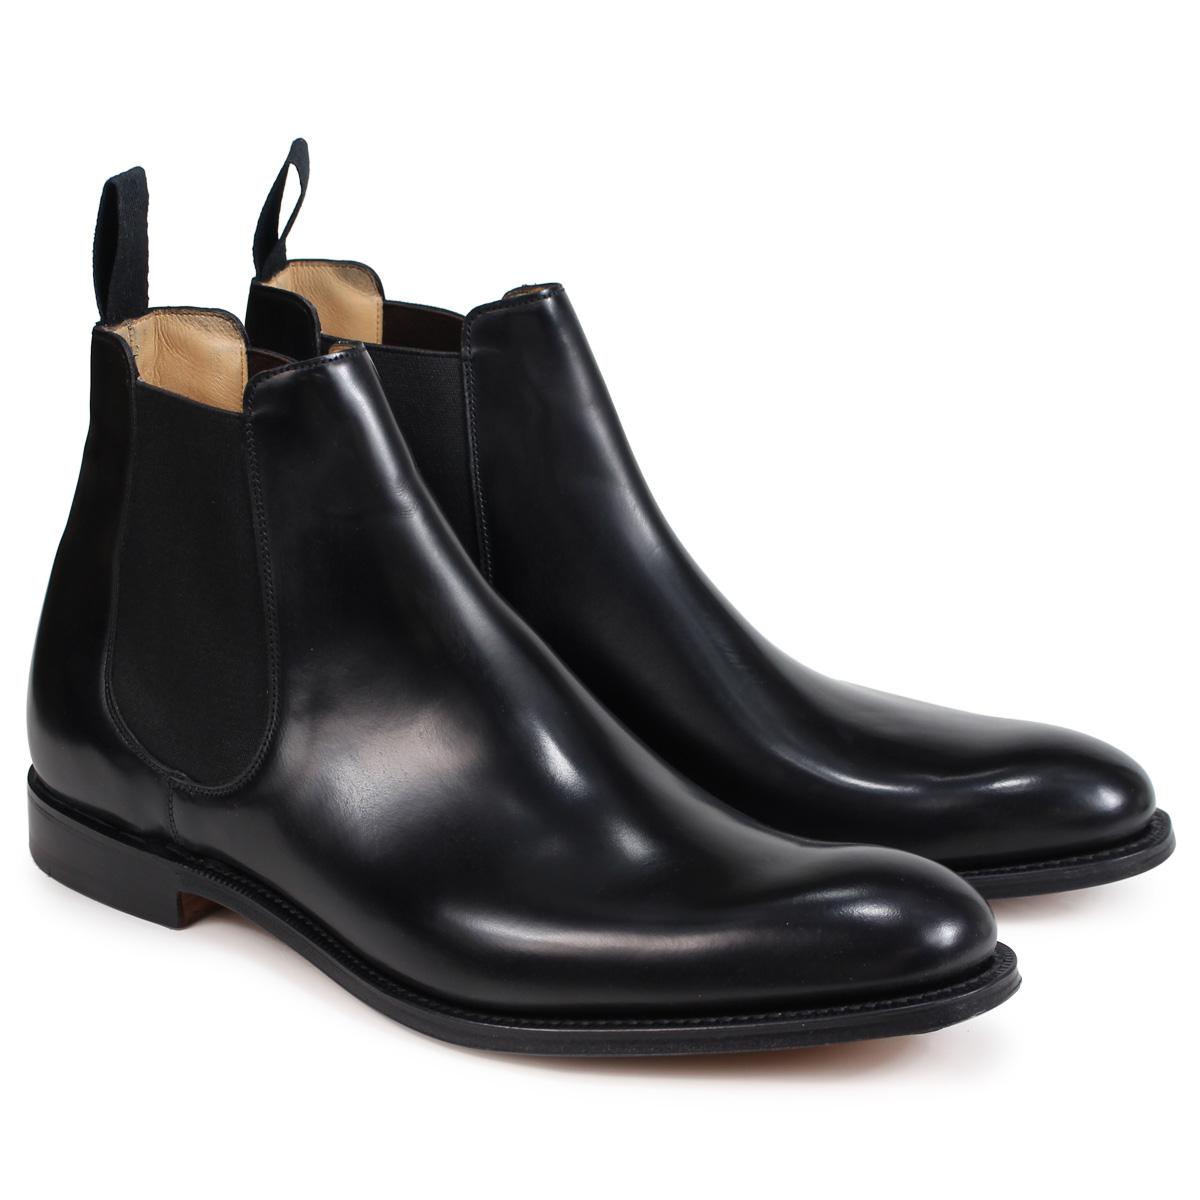 Churchs HOUSTON CHELSEA BOOTS POLISHED BINDER チャーチ 靴 ヒューストン ブーツ サイドゴア ショートブーツ メンズ ETB004 ブラック